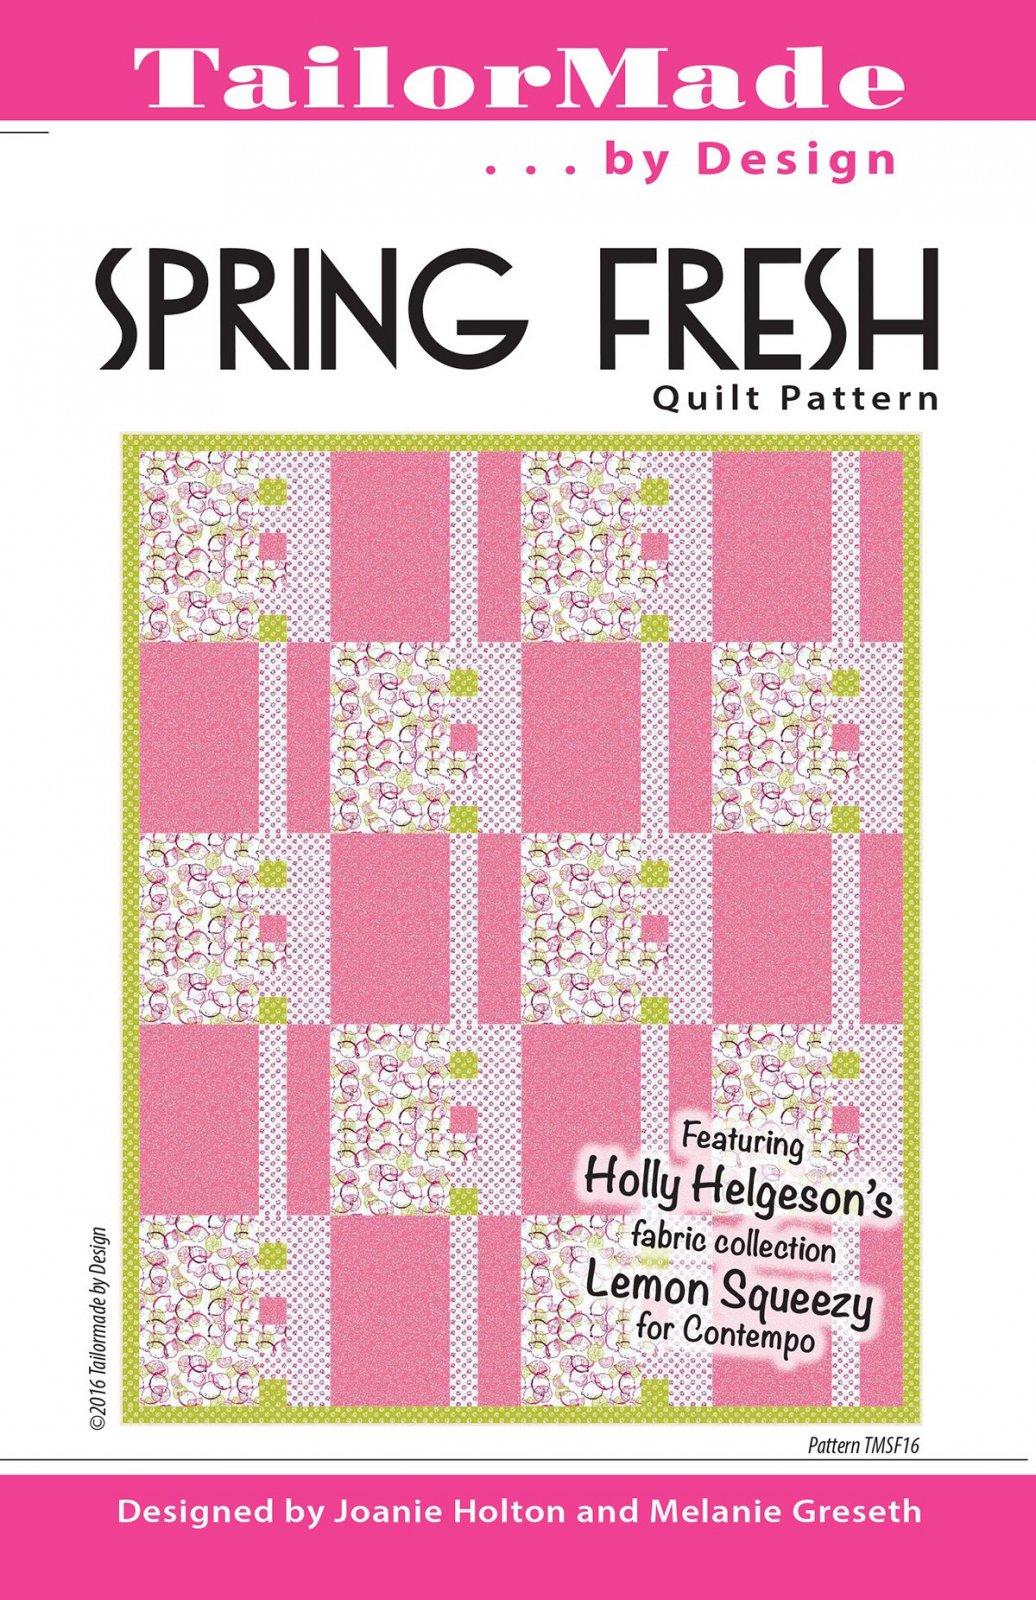 Spring Fresh Quilt